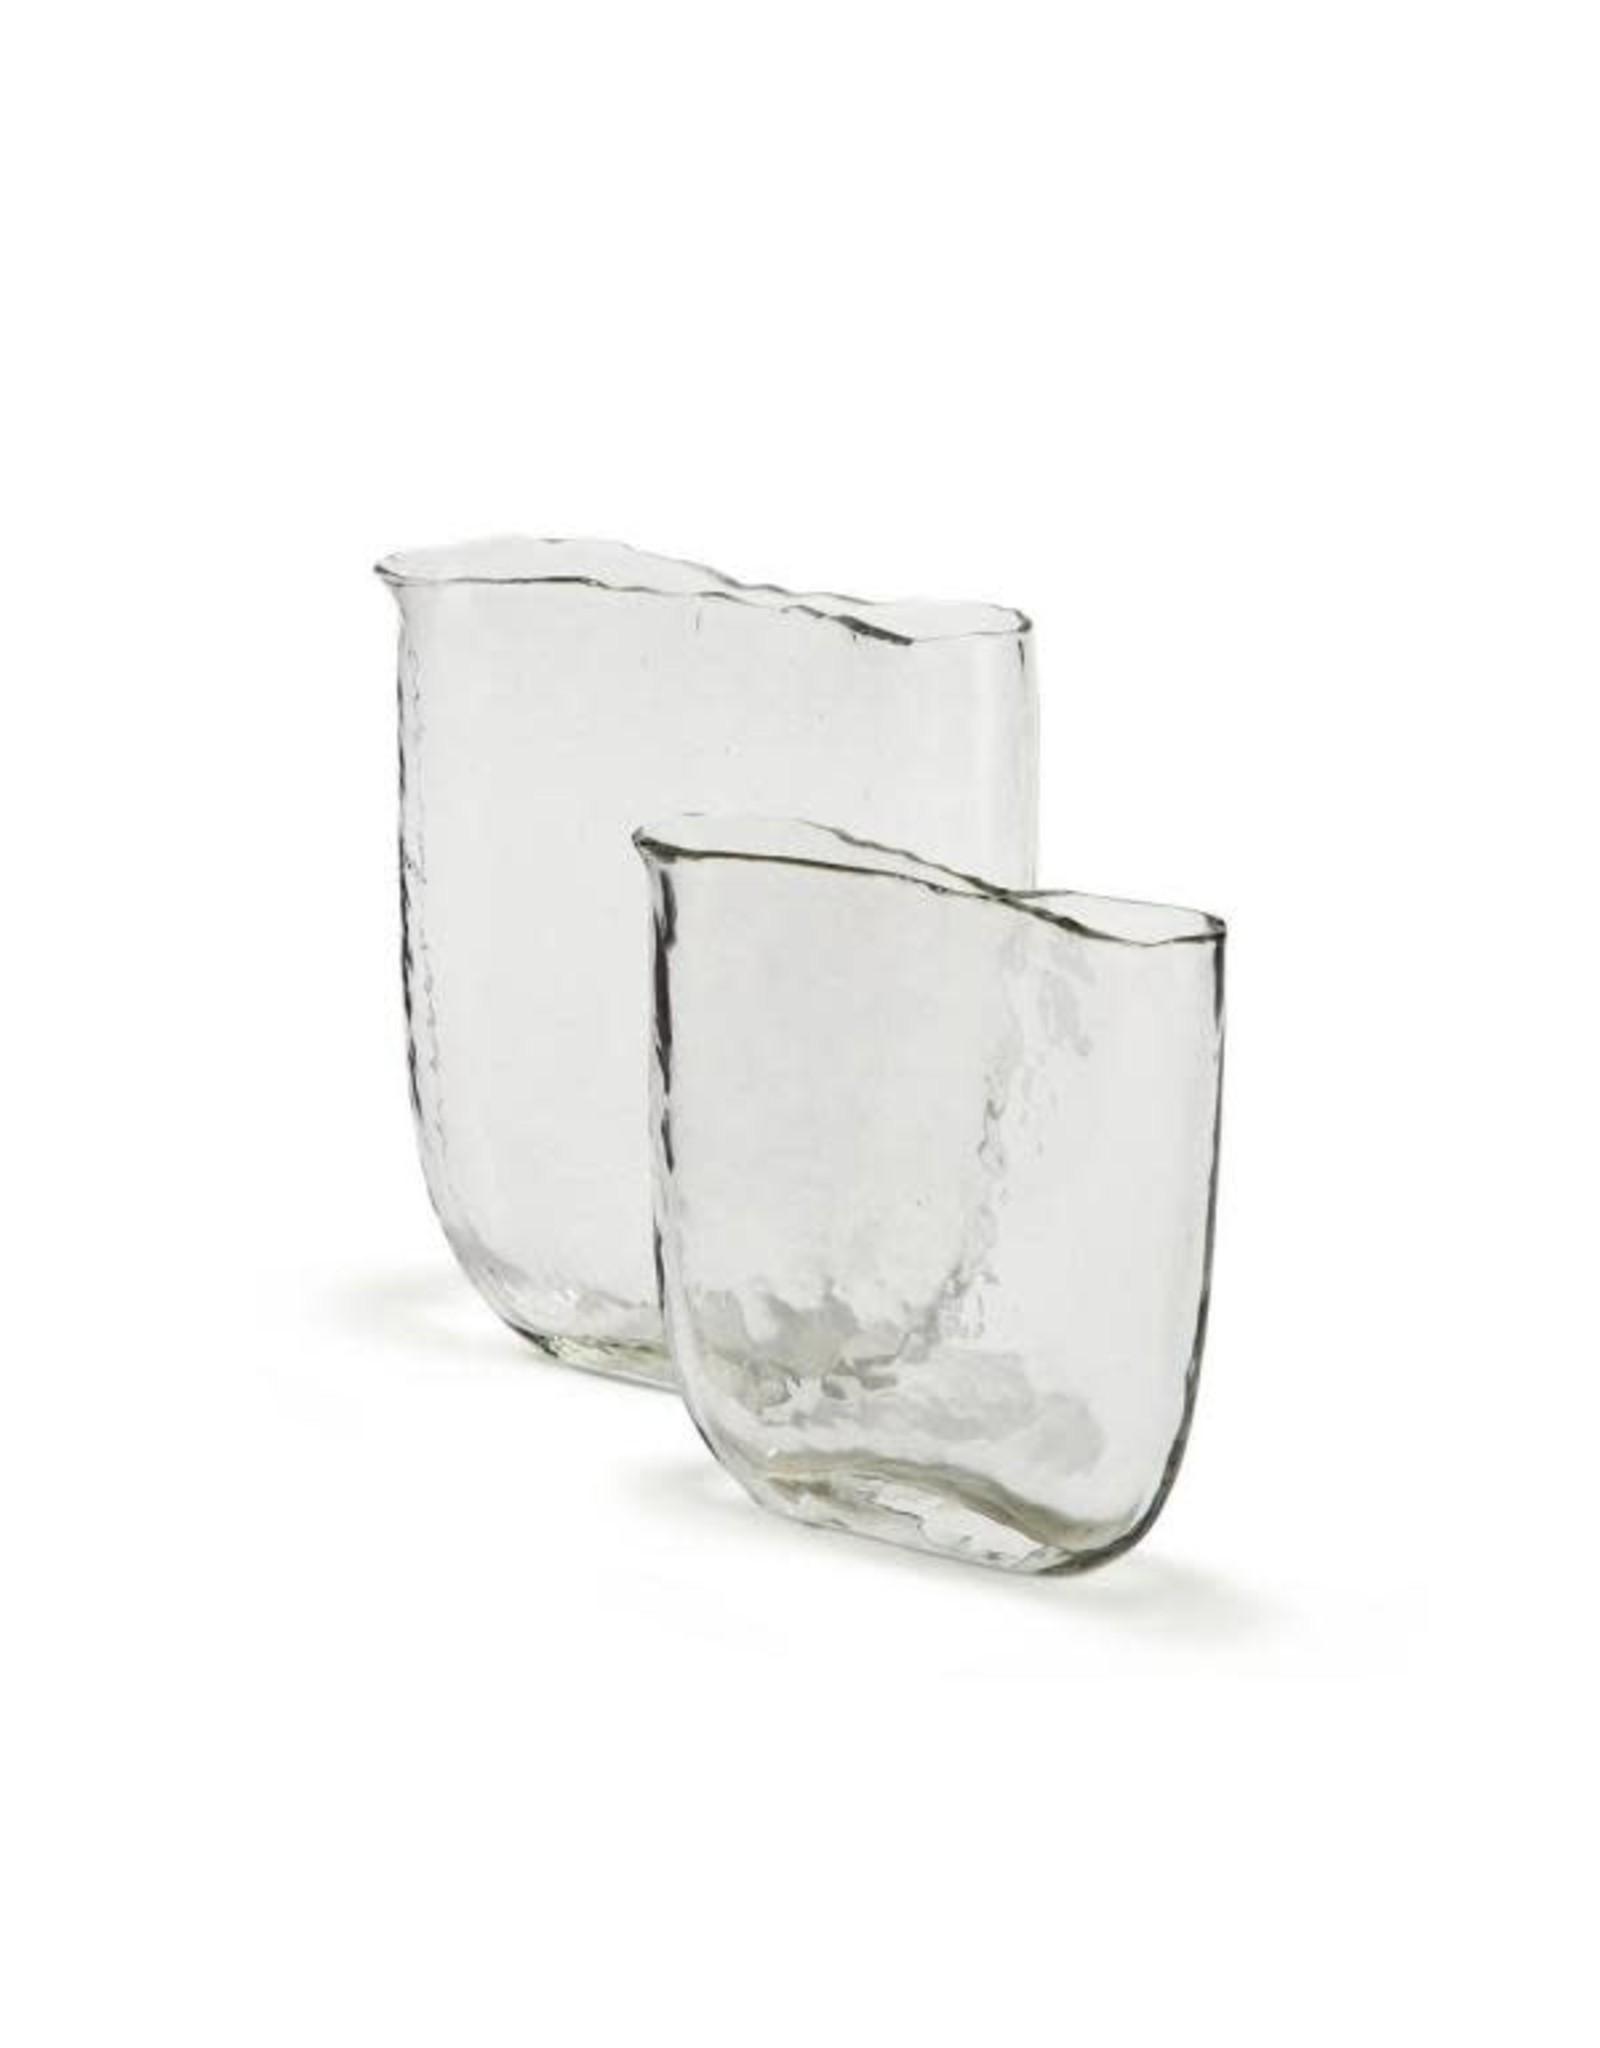 Oak + Arrow Interiors Ellipse Clear Vases - Small